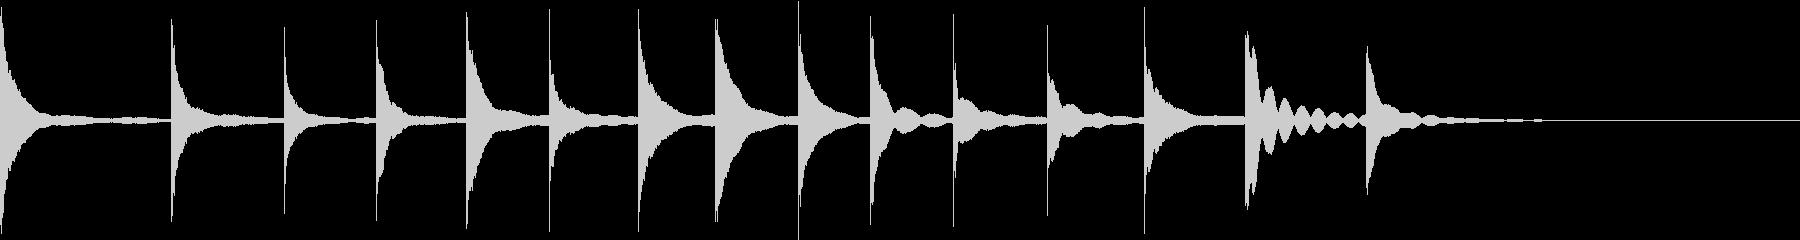 Doremi ドレミ 音階 ゆるかわの未再生の波形